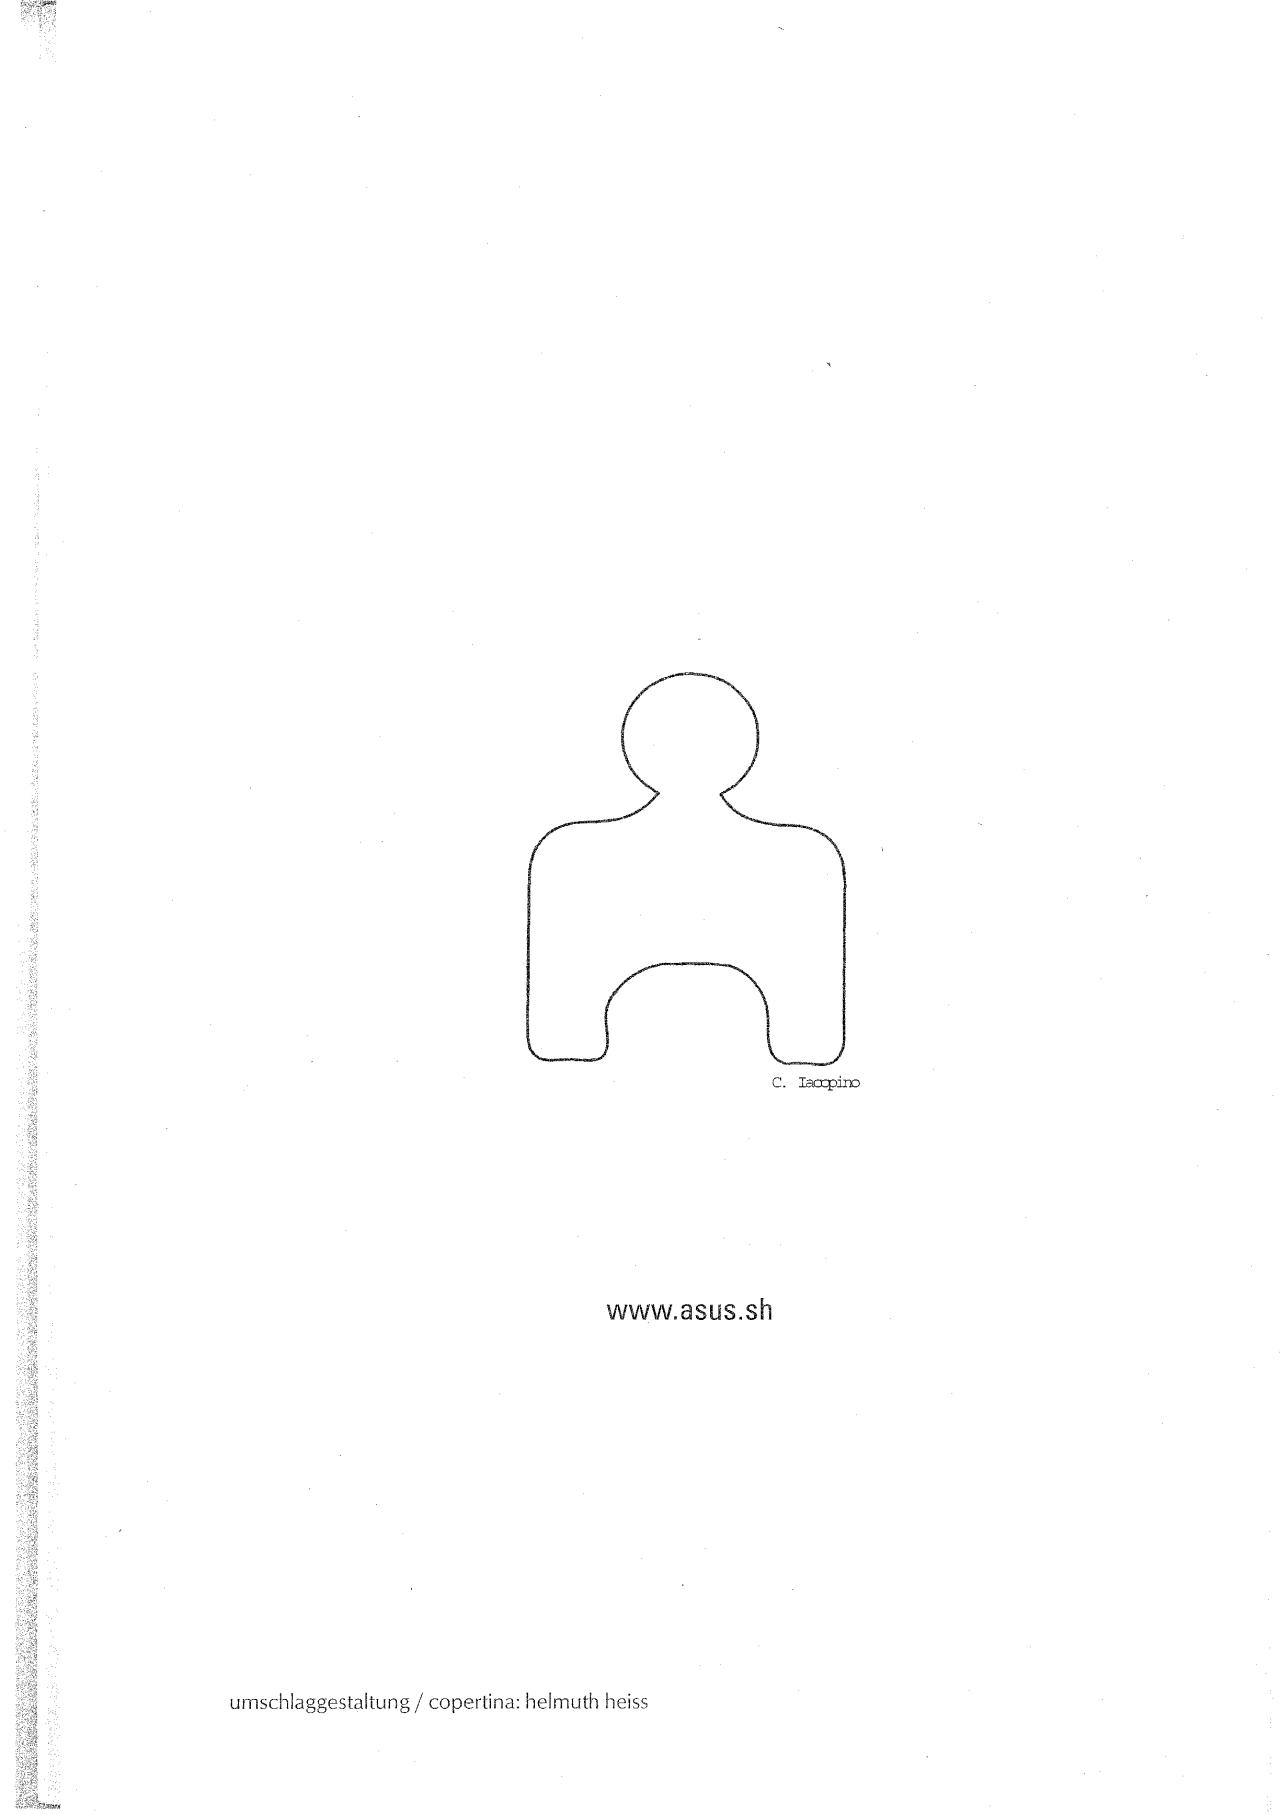 https://digital.tessmann.it/mediaArchive/media/image/Page/617849-200101/617849-200101_1_object_5836593.png?auth=1da8ff93475f4aeb92e5996160eef901